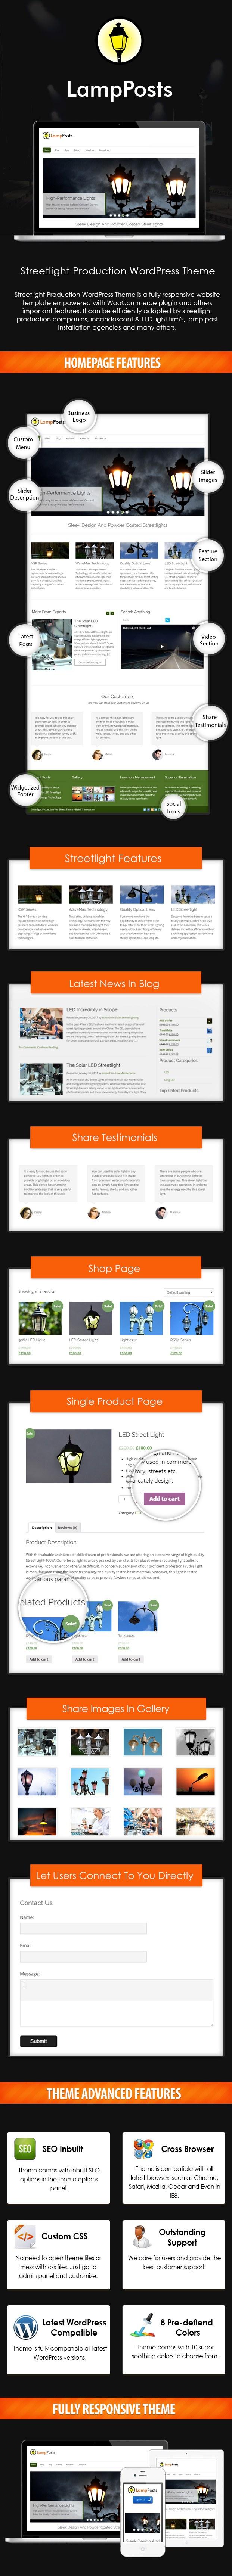 Streetlight Production WordPress Theme Sales